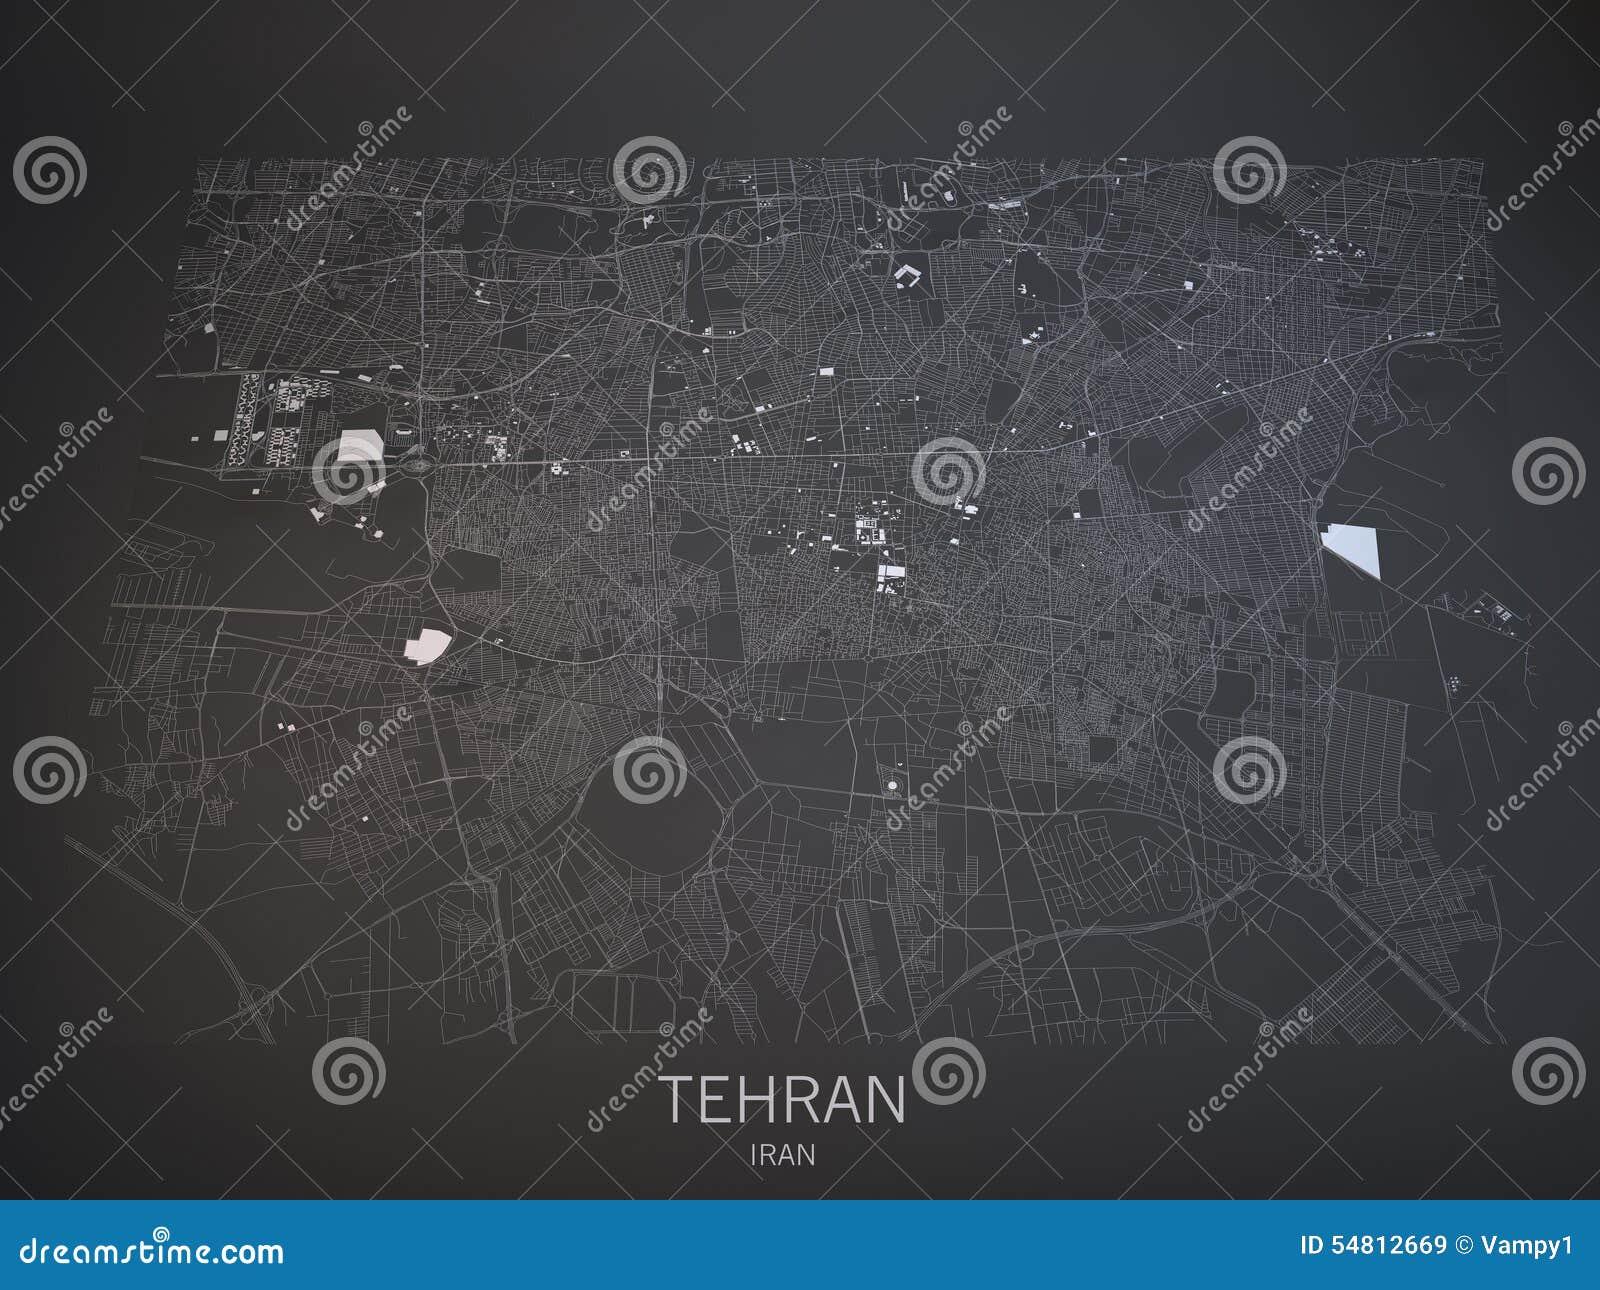 Tehran streets and buildings 3d map Iran